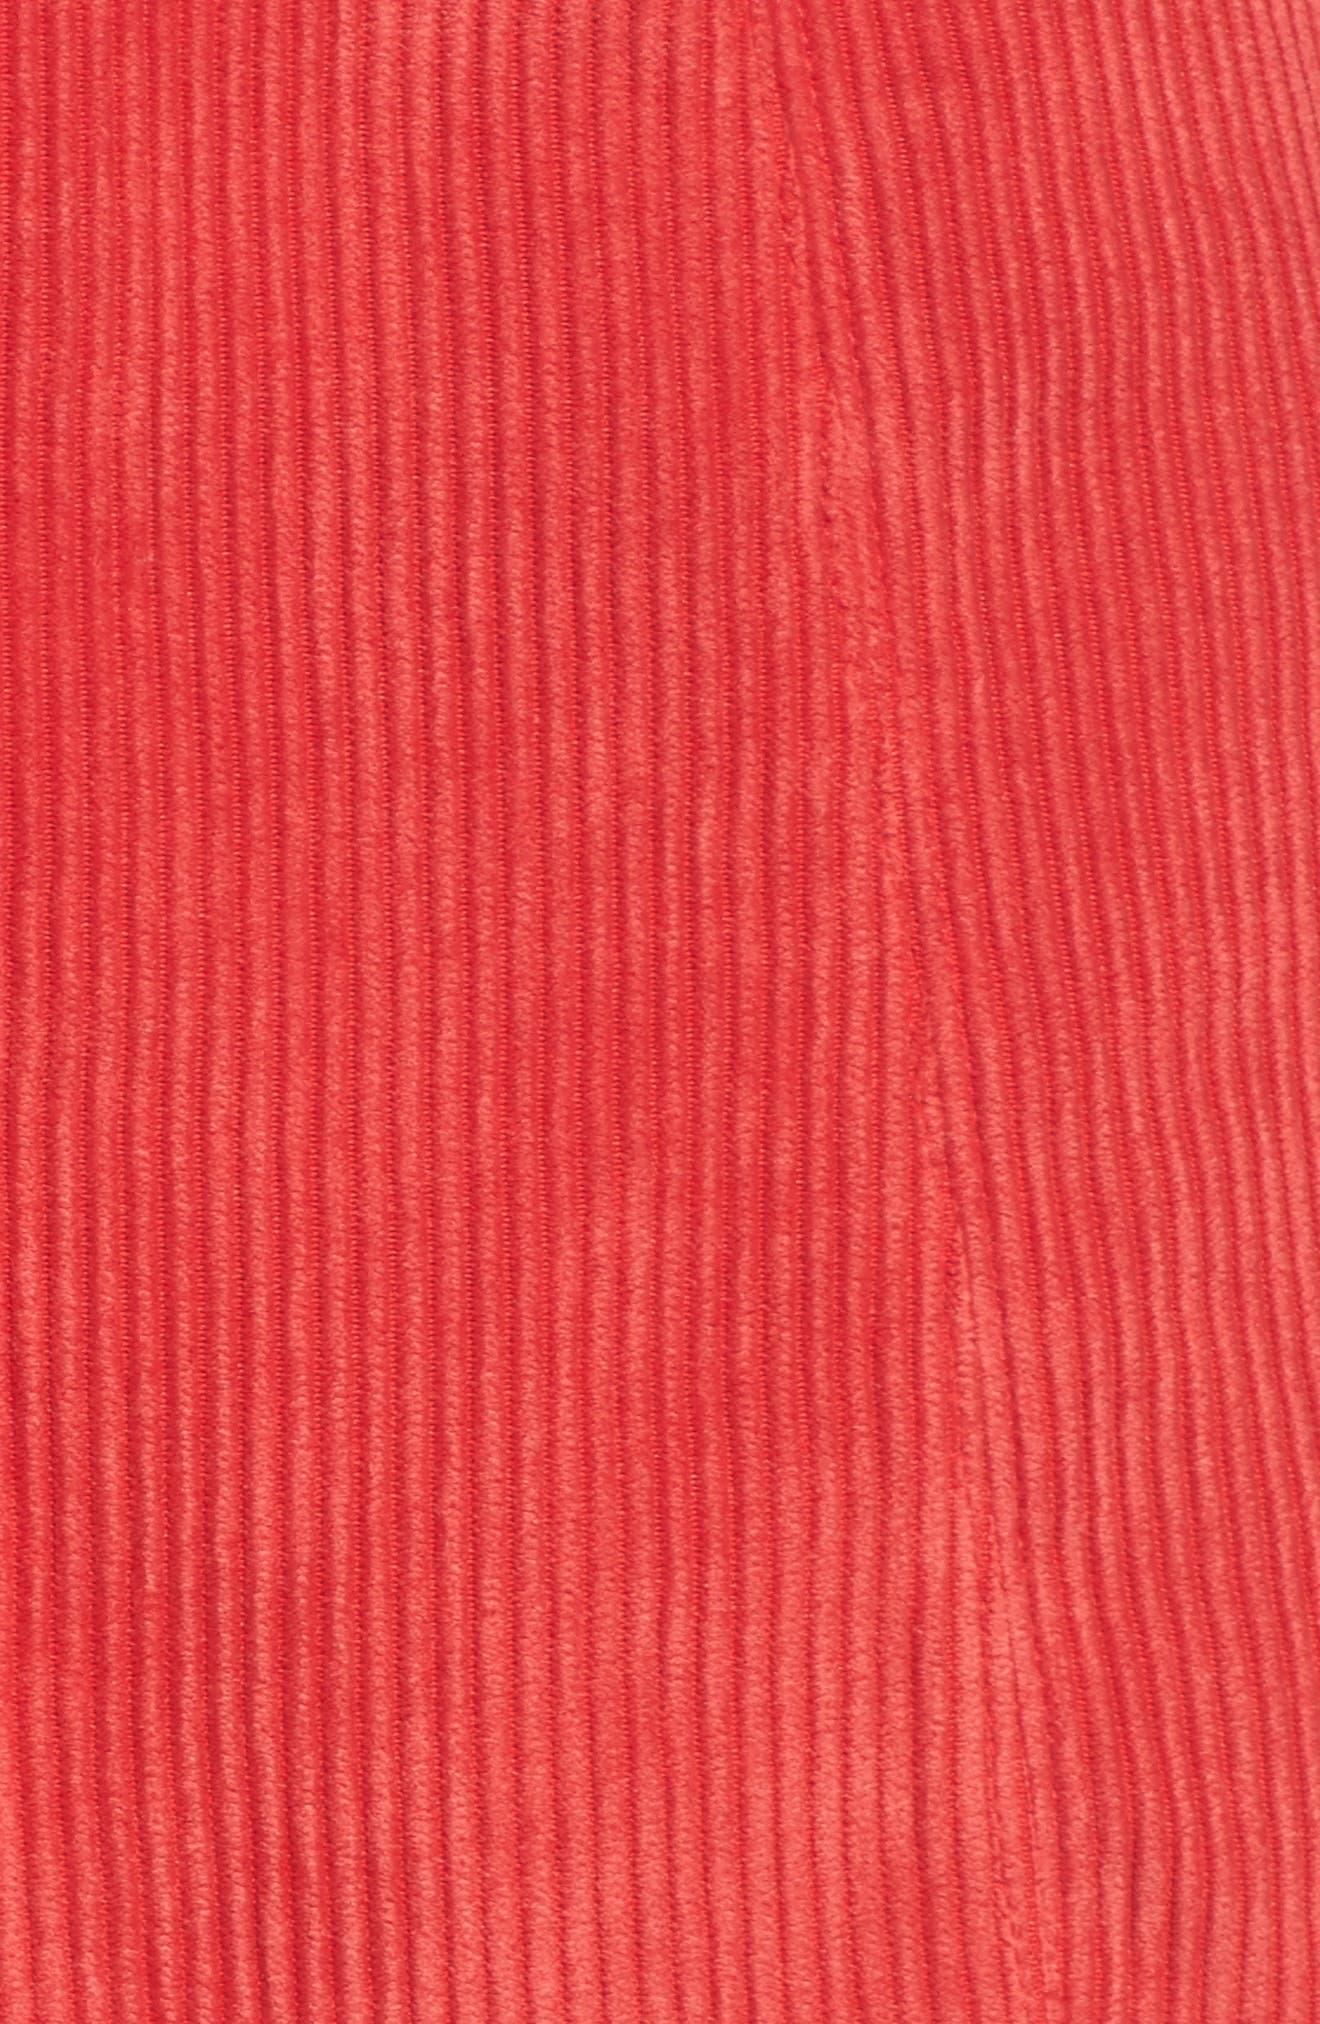 Central Corduroy Scallop Hem Skirt,                             Alternate thumbnail 5, color,                             621